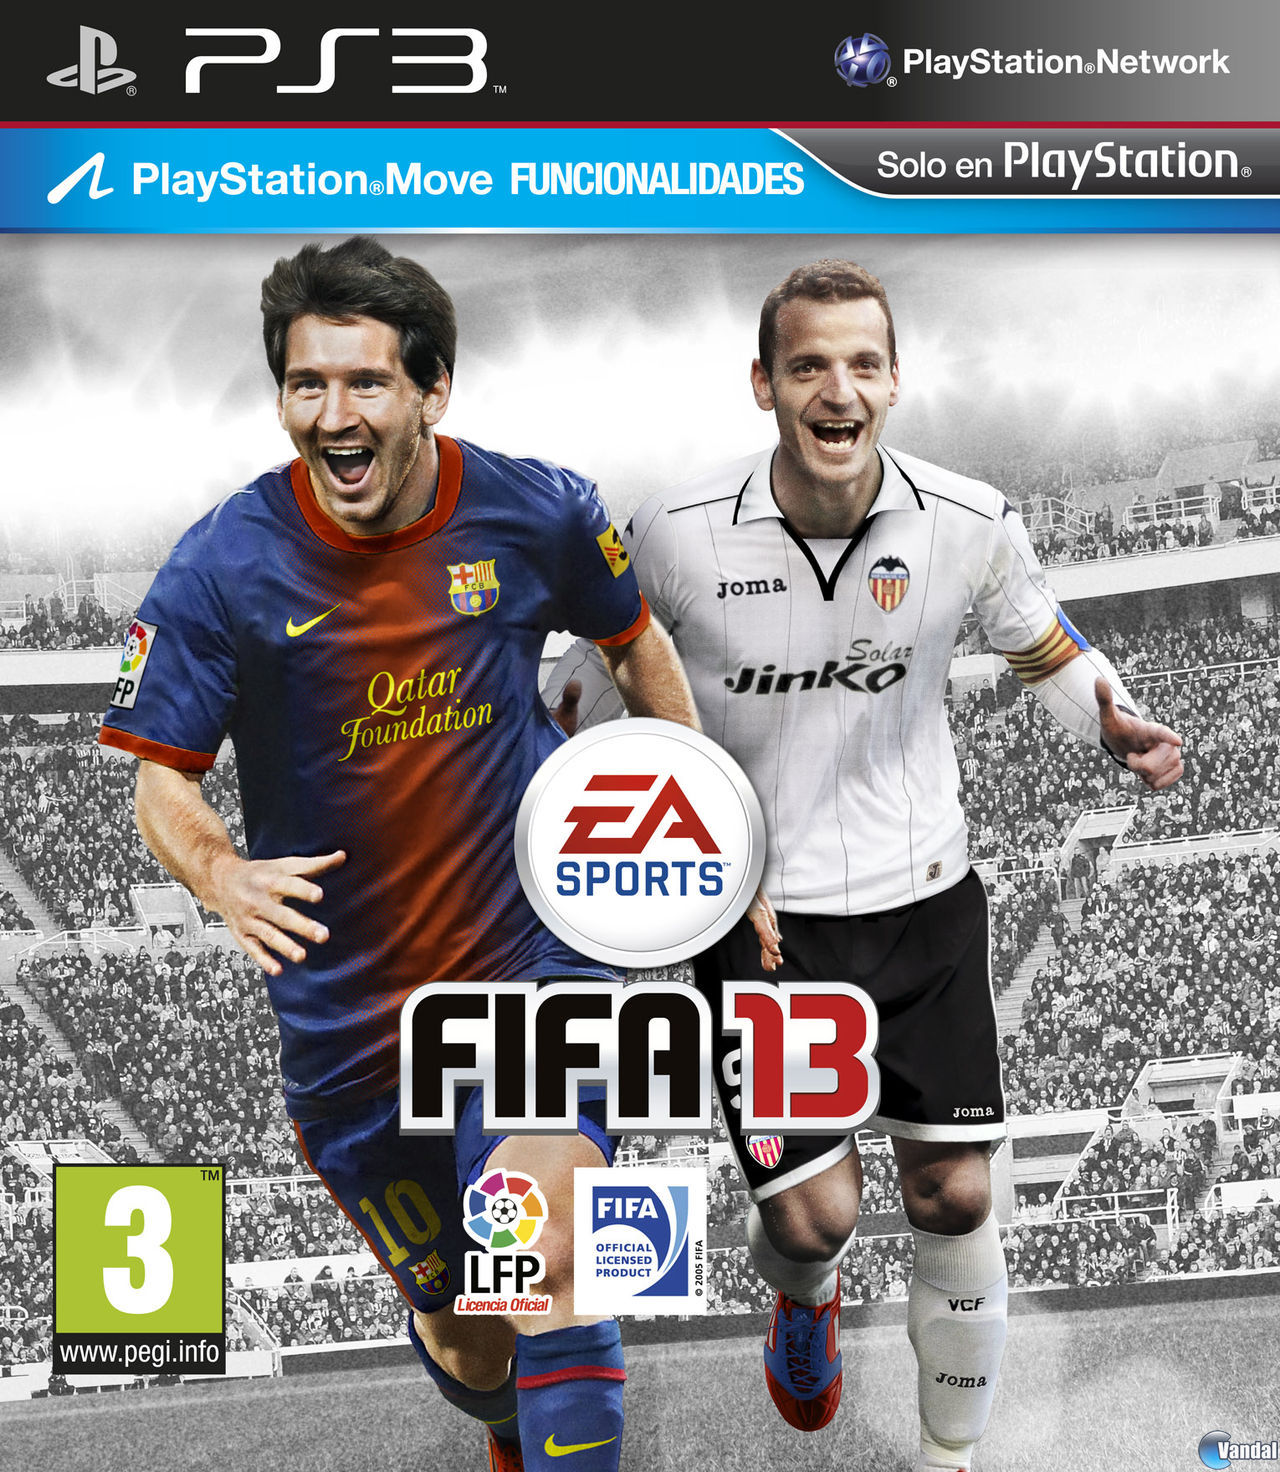 Imagen 113 de FIFA 13 para PlayStation 3